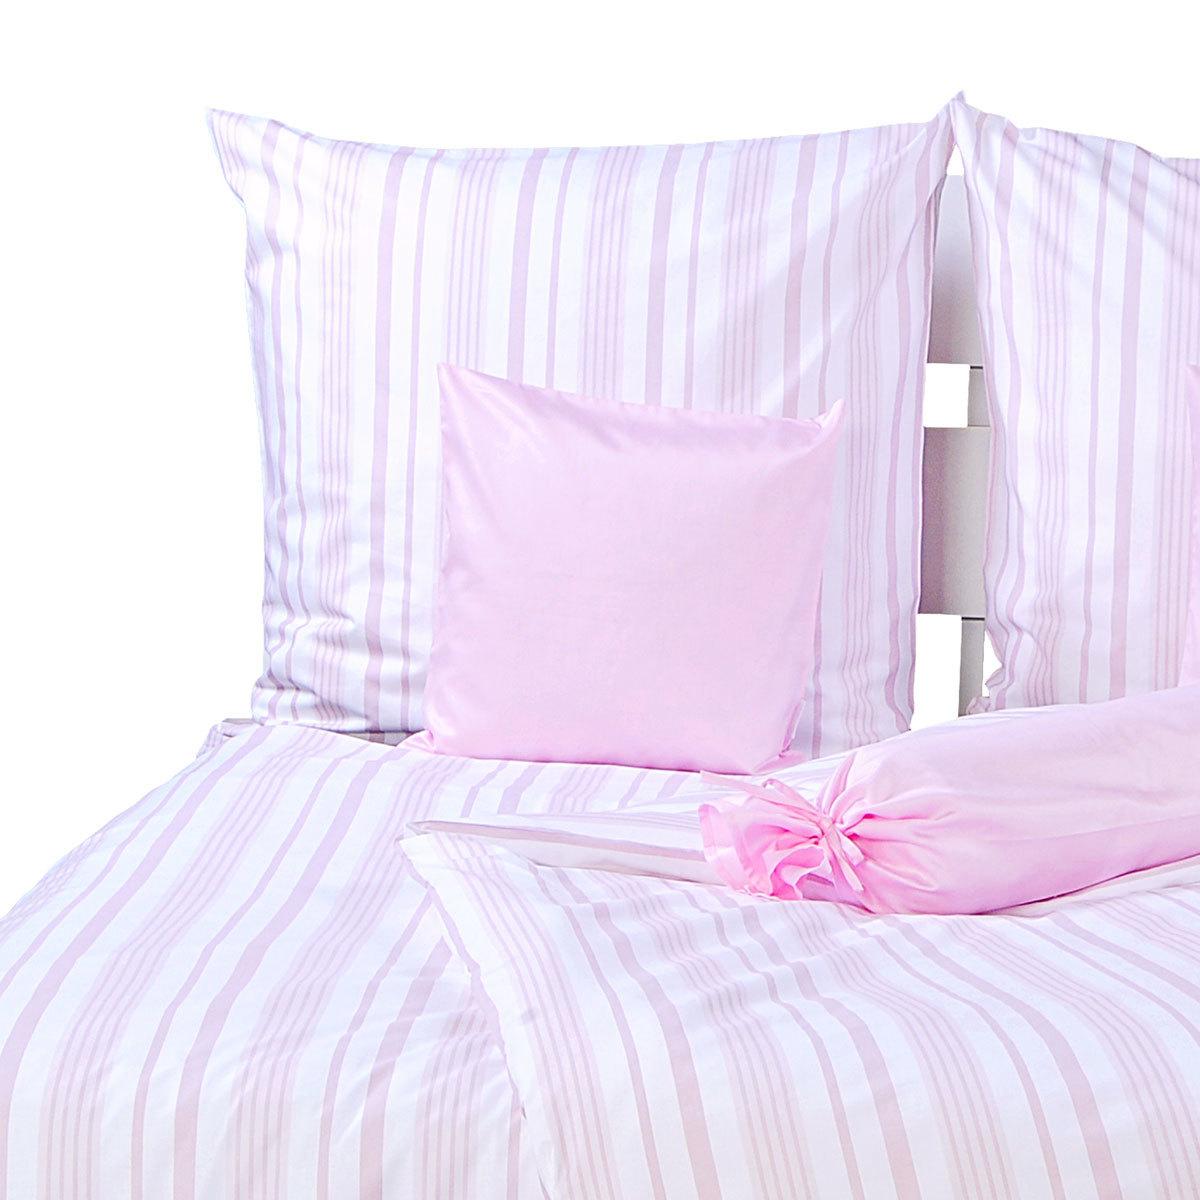 momm perkal bettw sche adela rosa g nstig online kaufen bei bettwaren shop. Black Bedroom Furniture Sets. Home Design Ideas